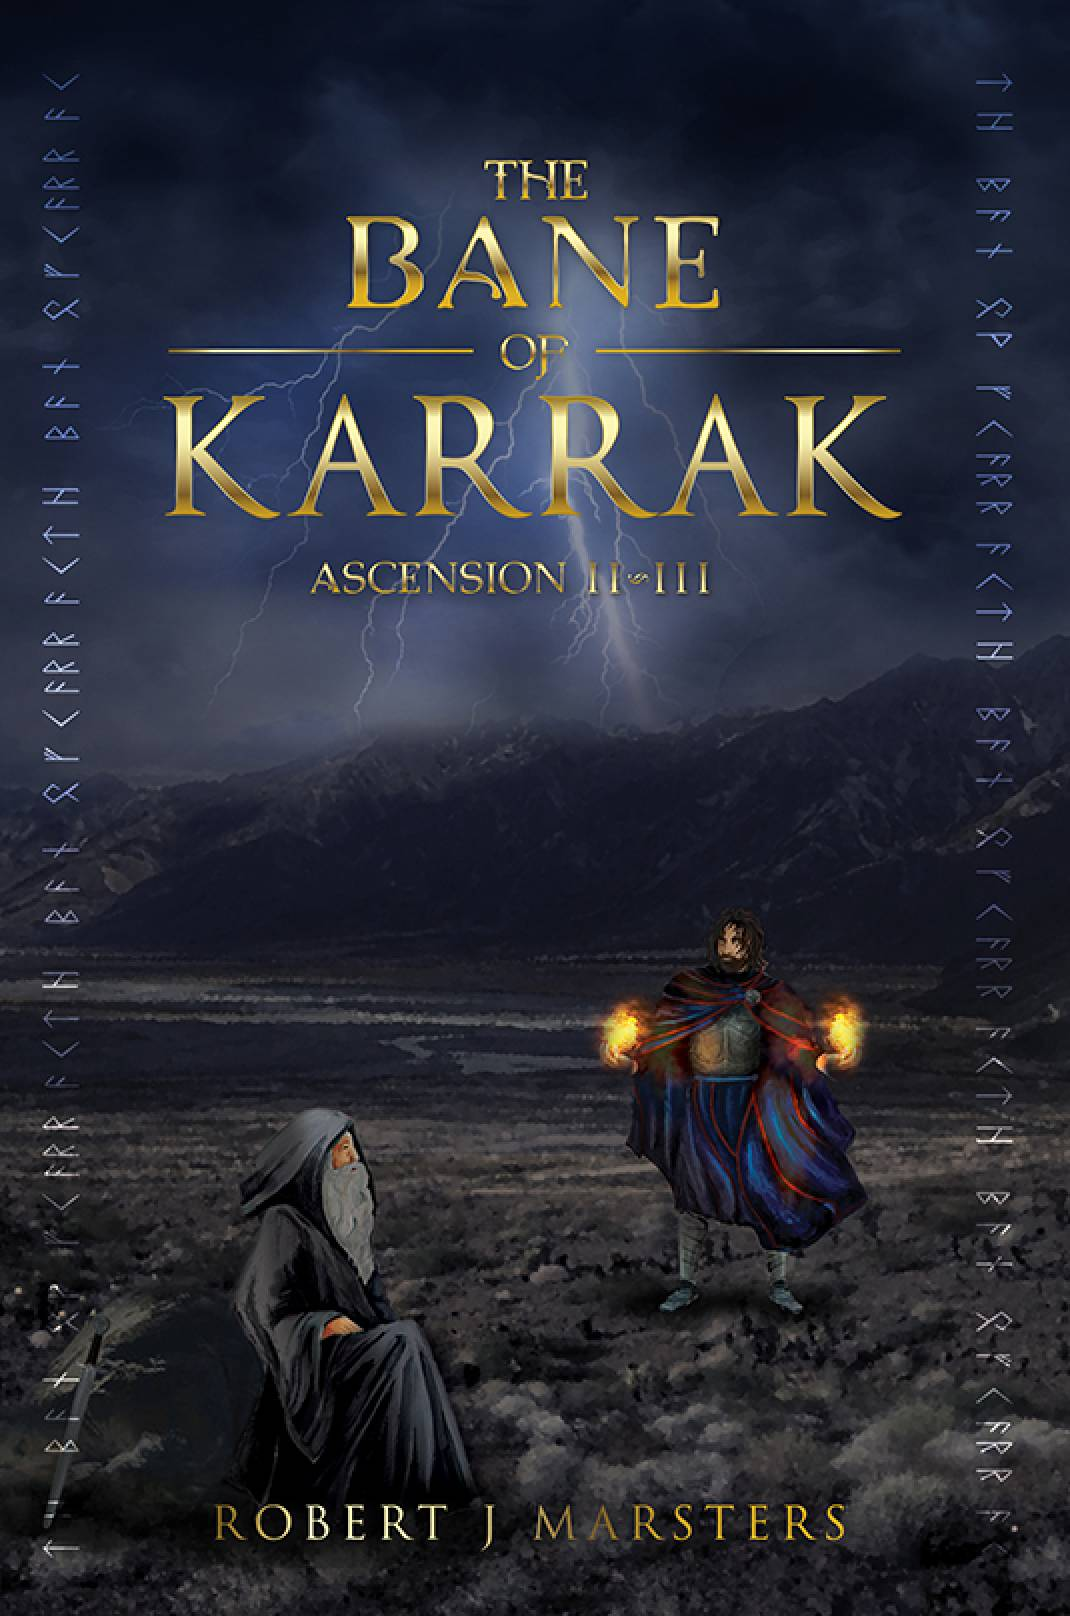 The Bane of Karrak - Ascension Two of three